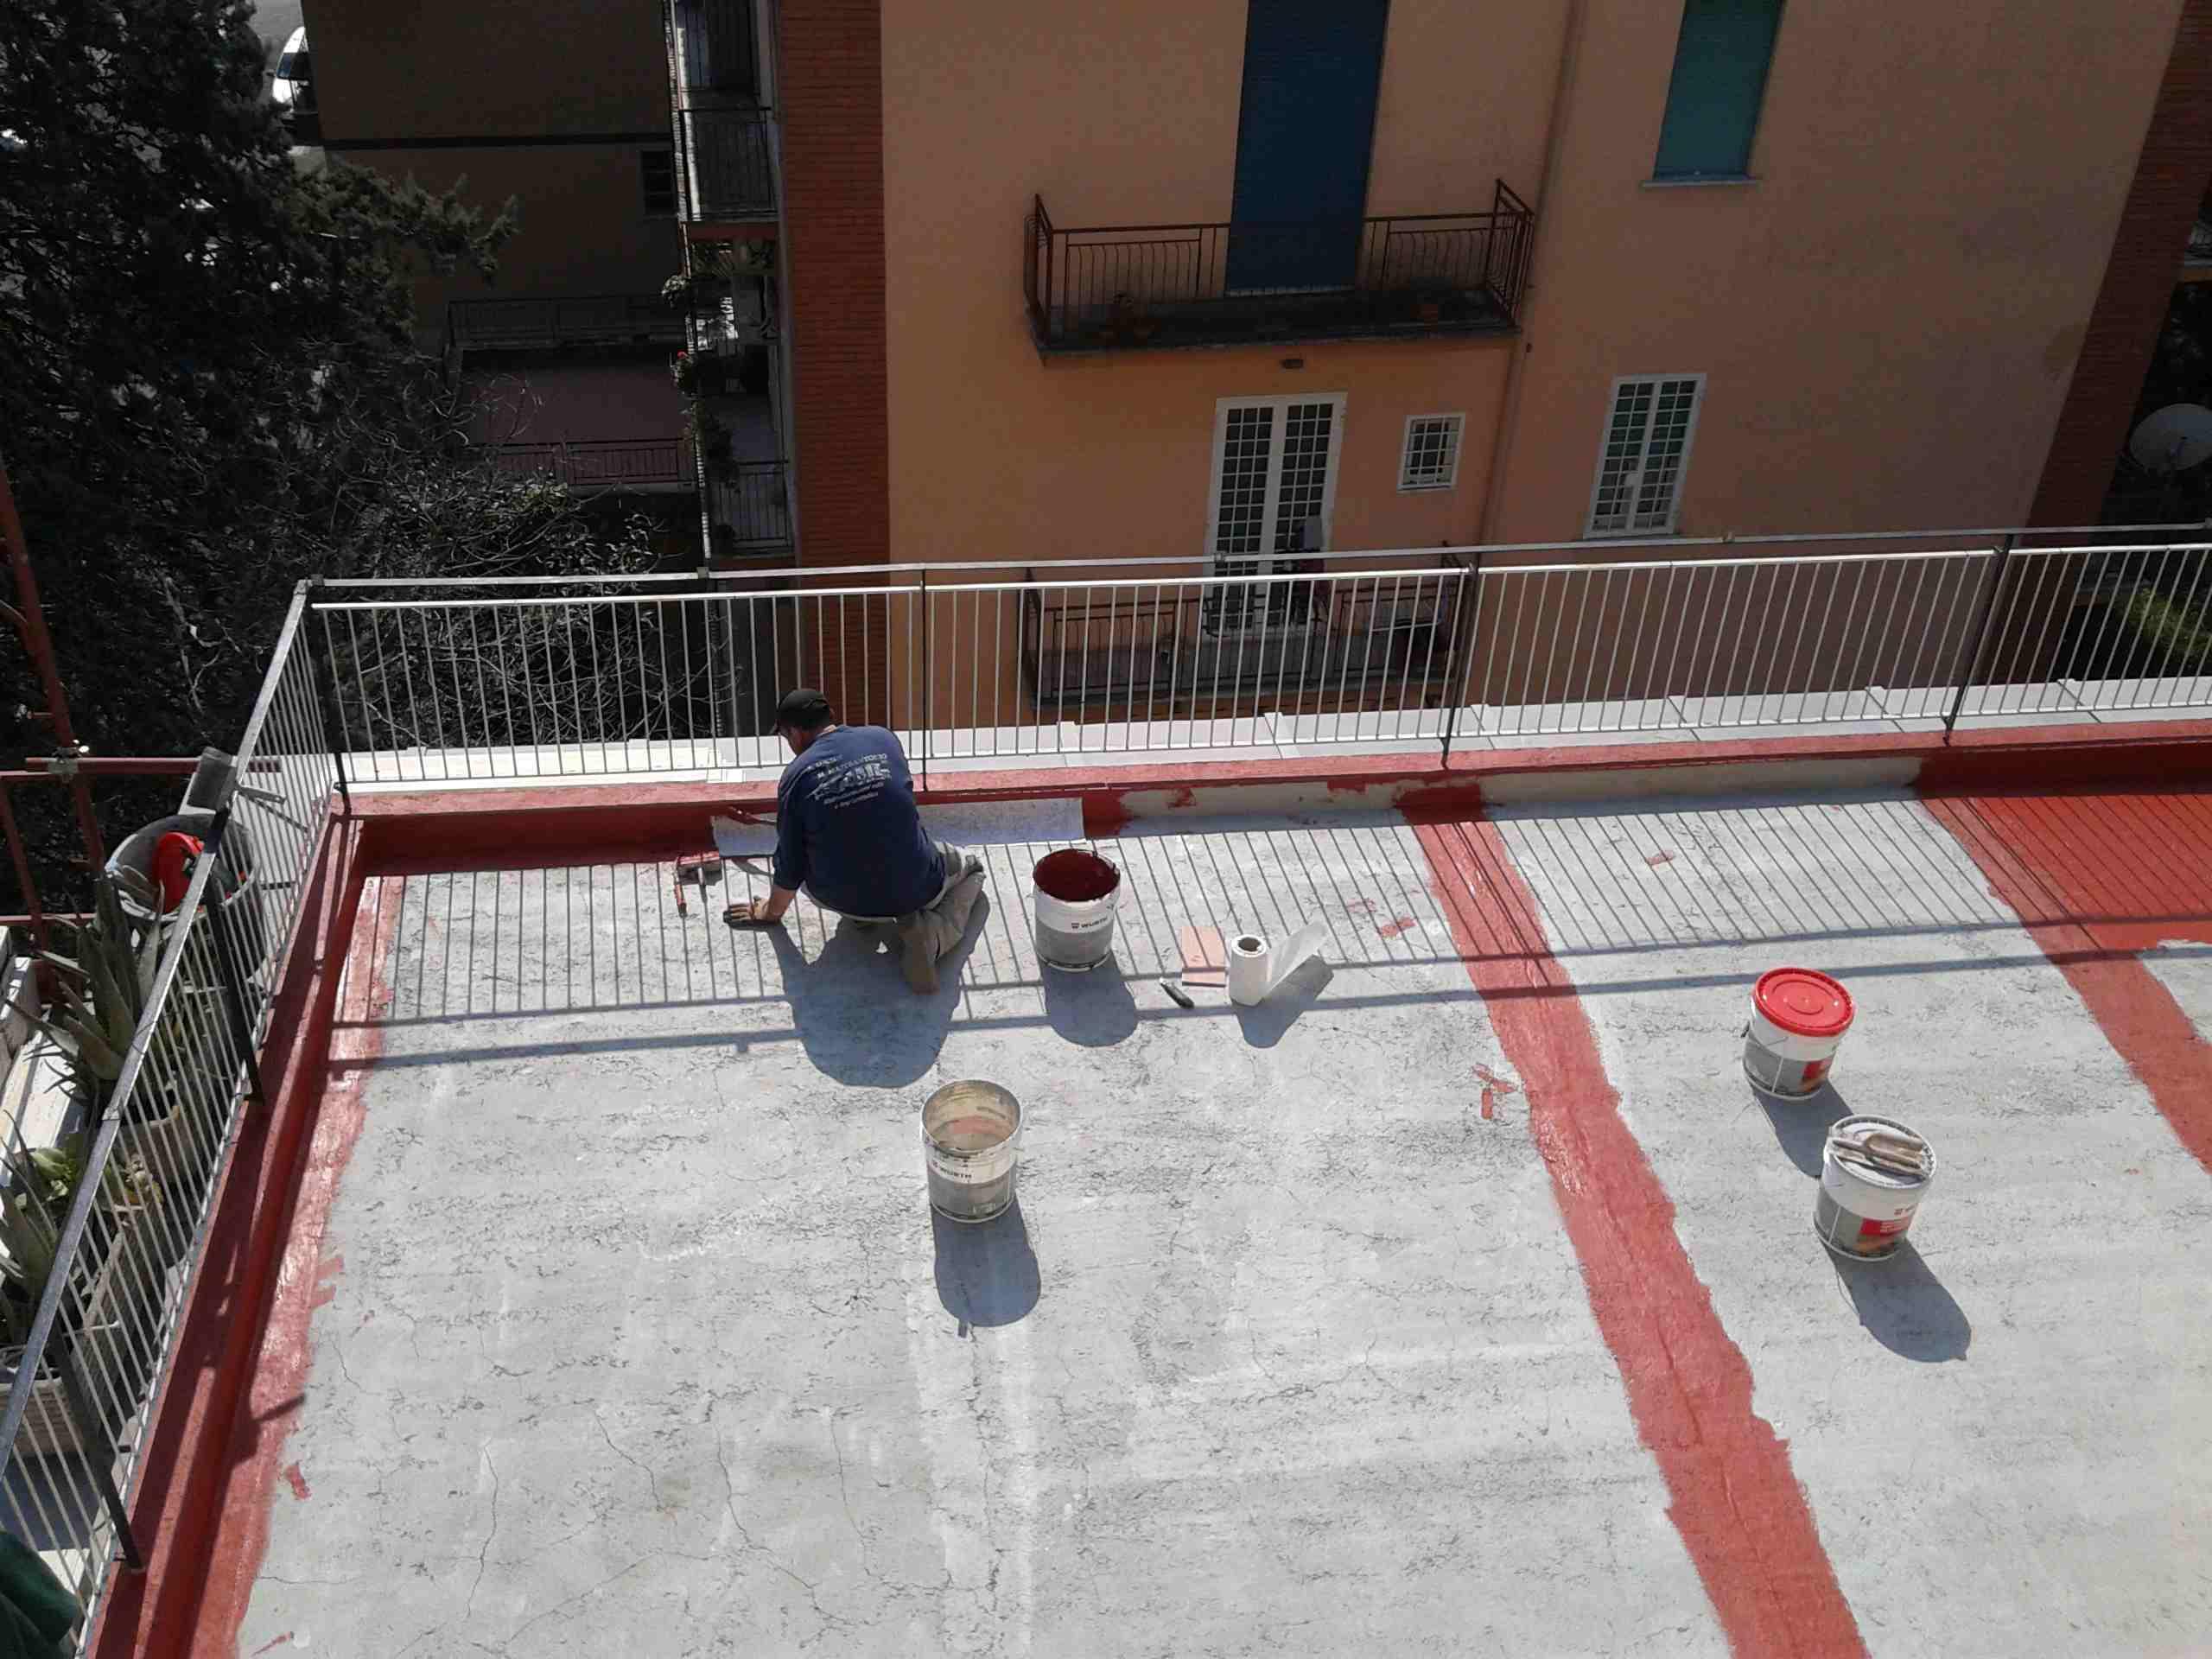 Emejing Rifacimento Terrazzo Condominiale Photos - Design Trends ...